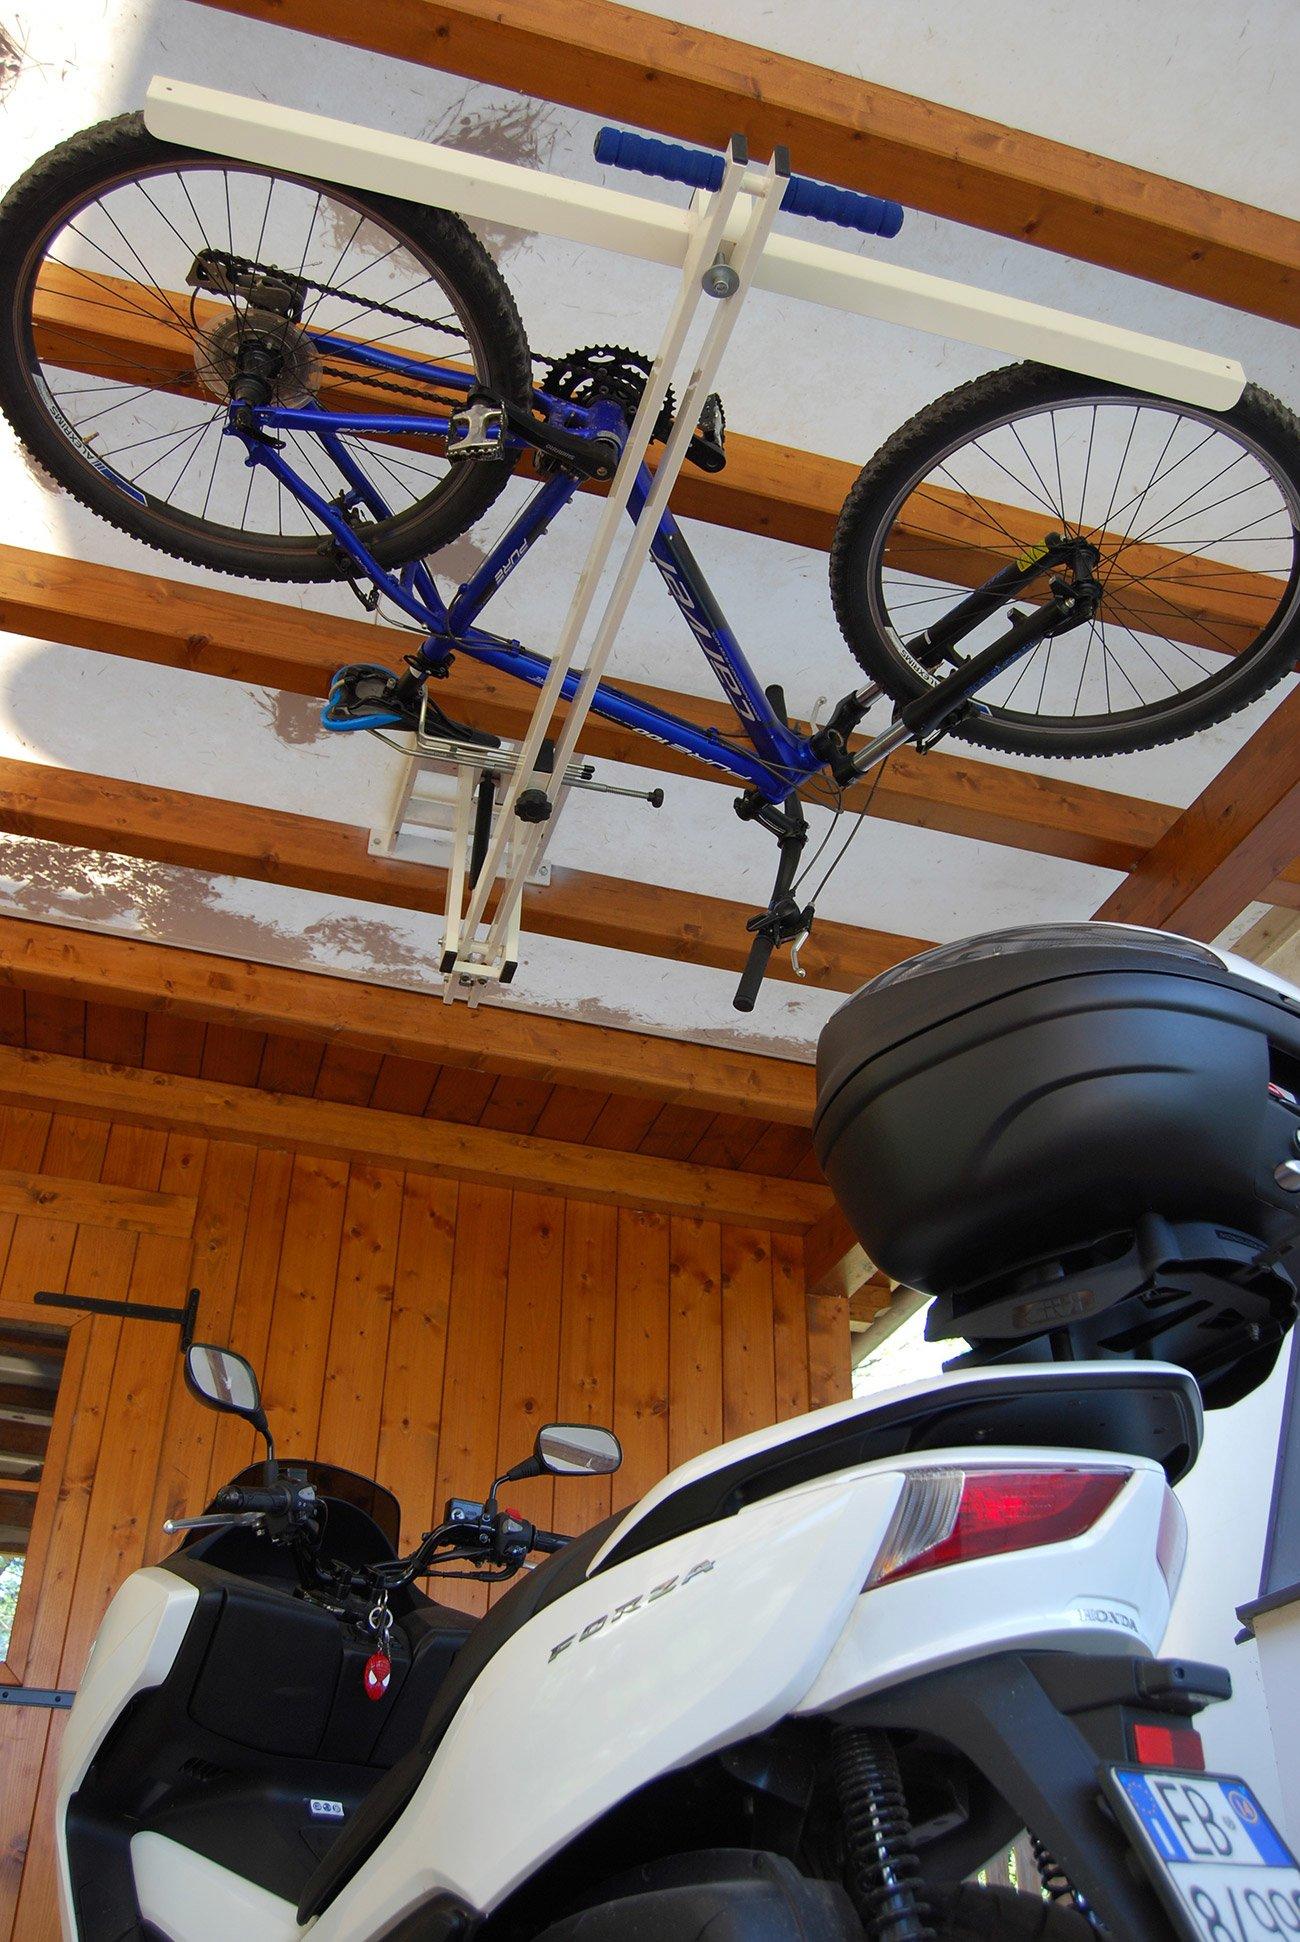 Ceiling Bike Lift For Garages Hallways Basements Flat